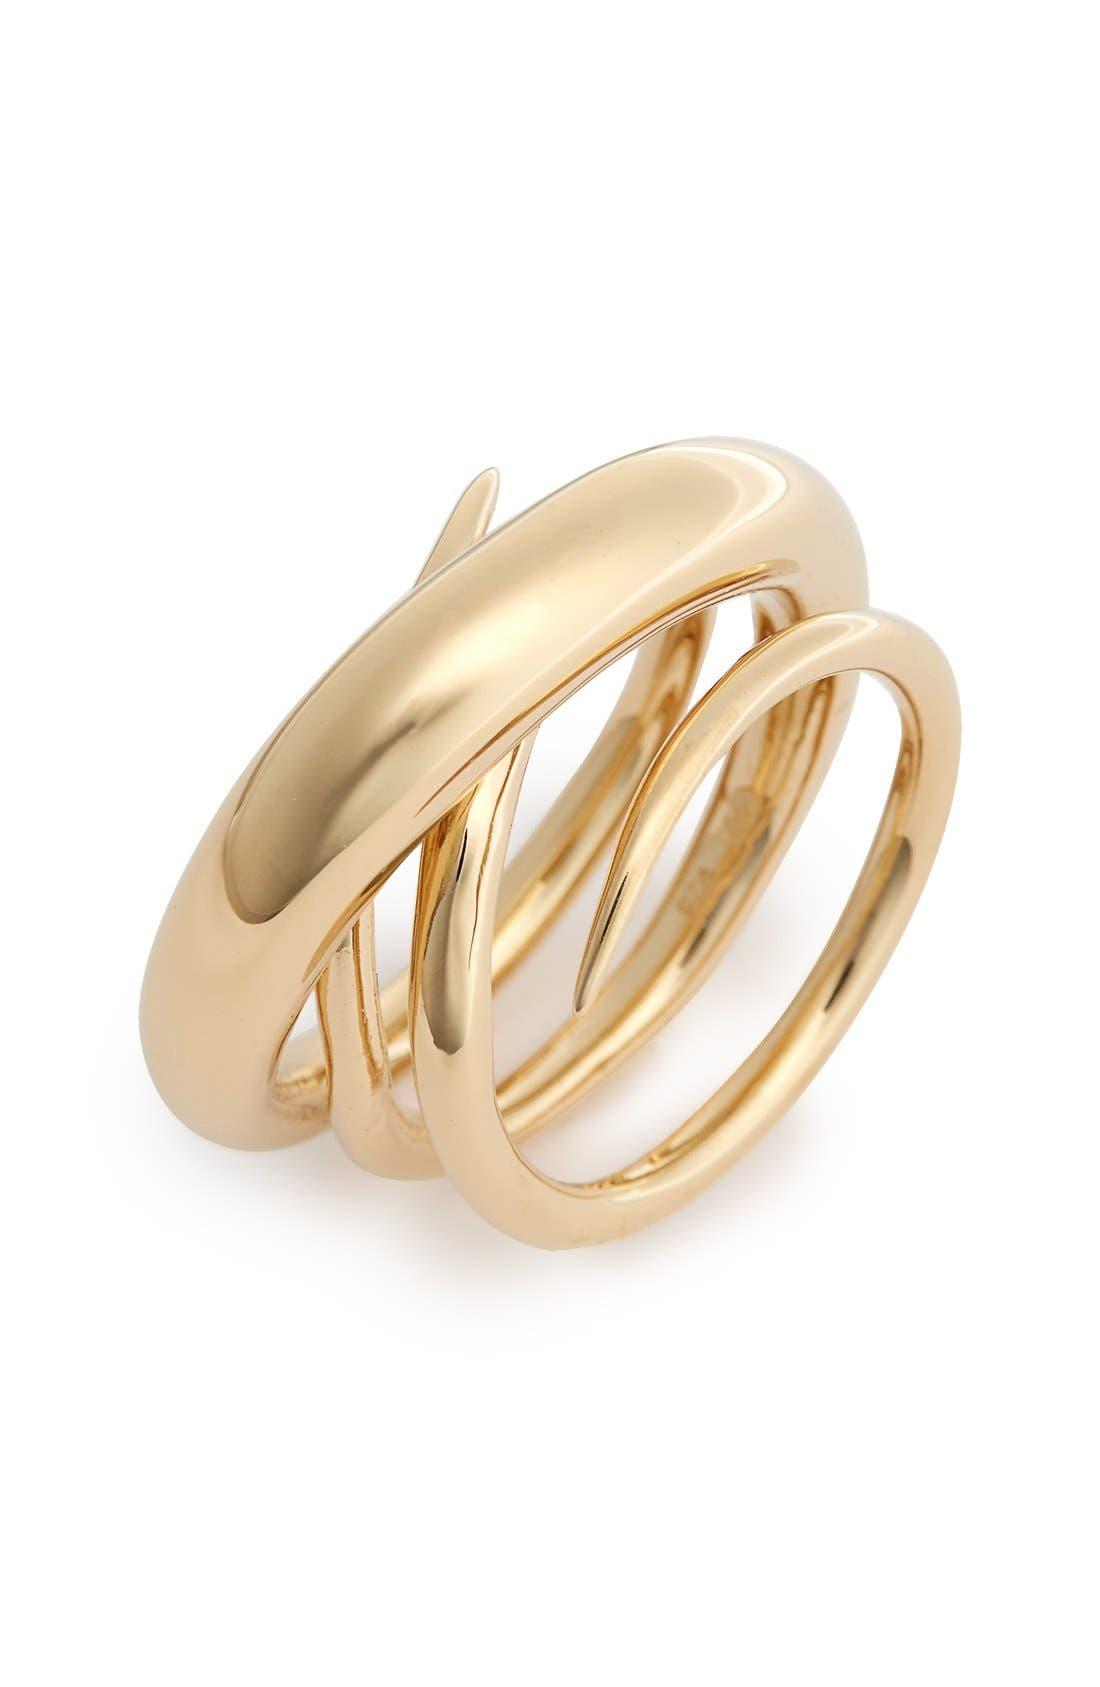 Charlotte Chesnais 'Hurly Burly' Ring